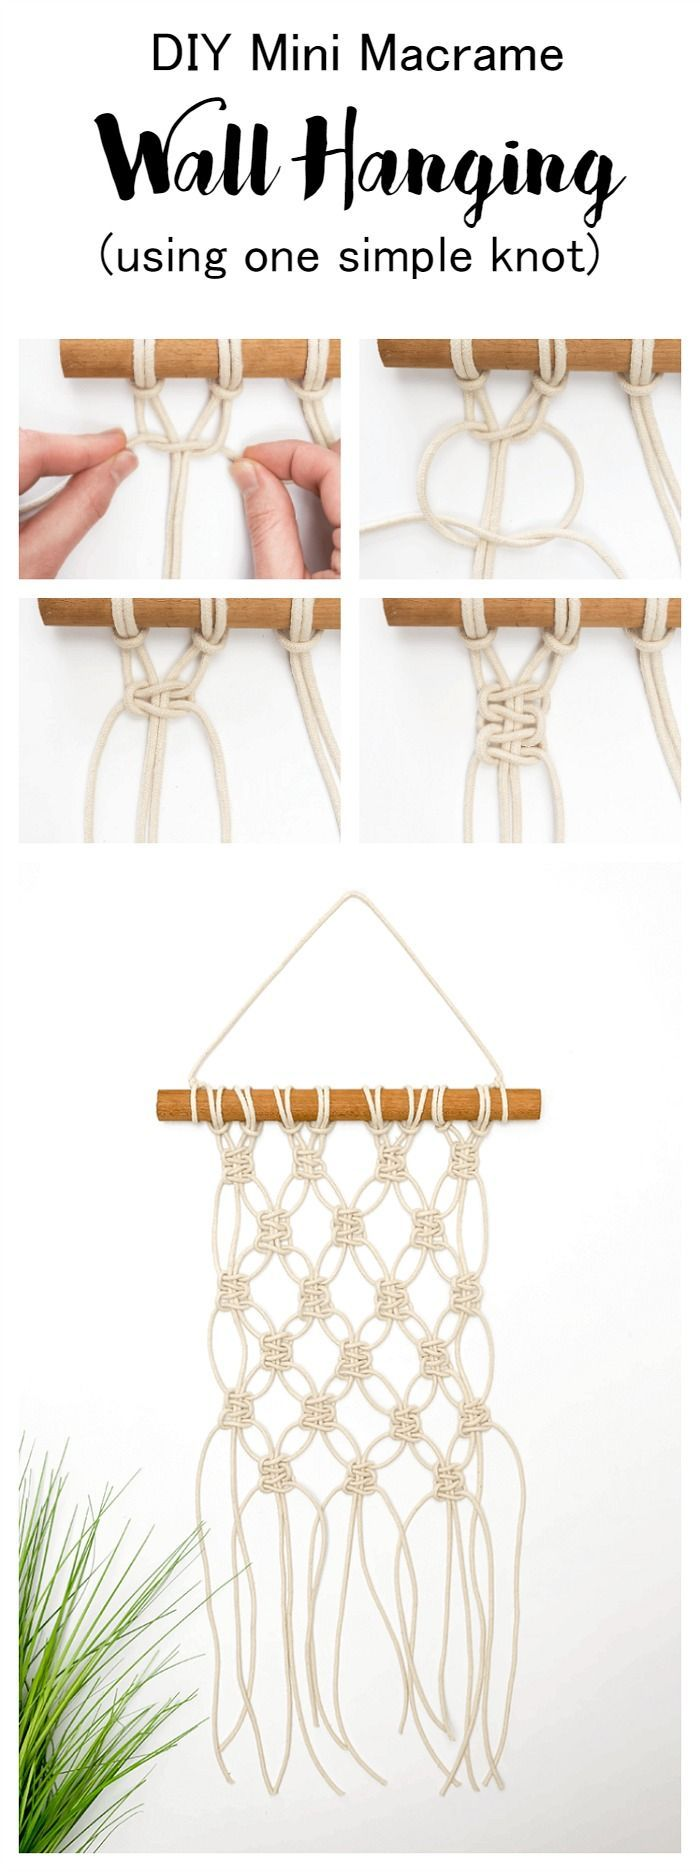 DIY Mini Macrame Wall Hanging